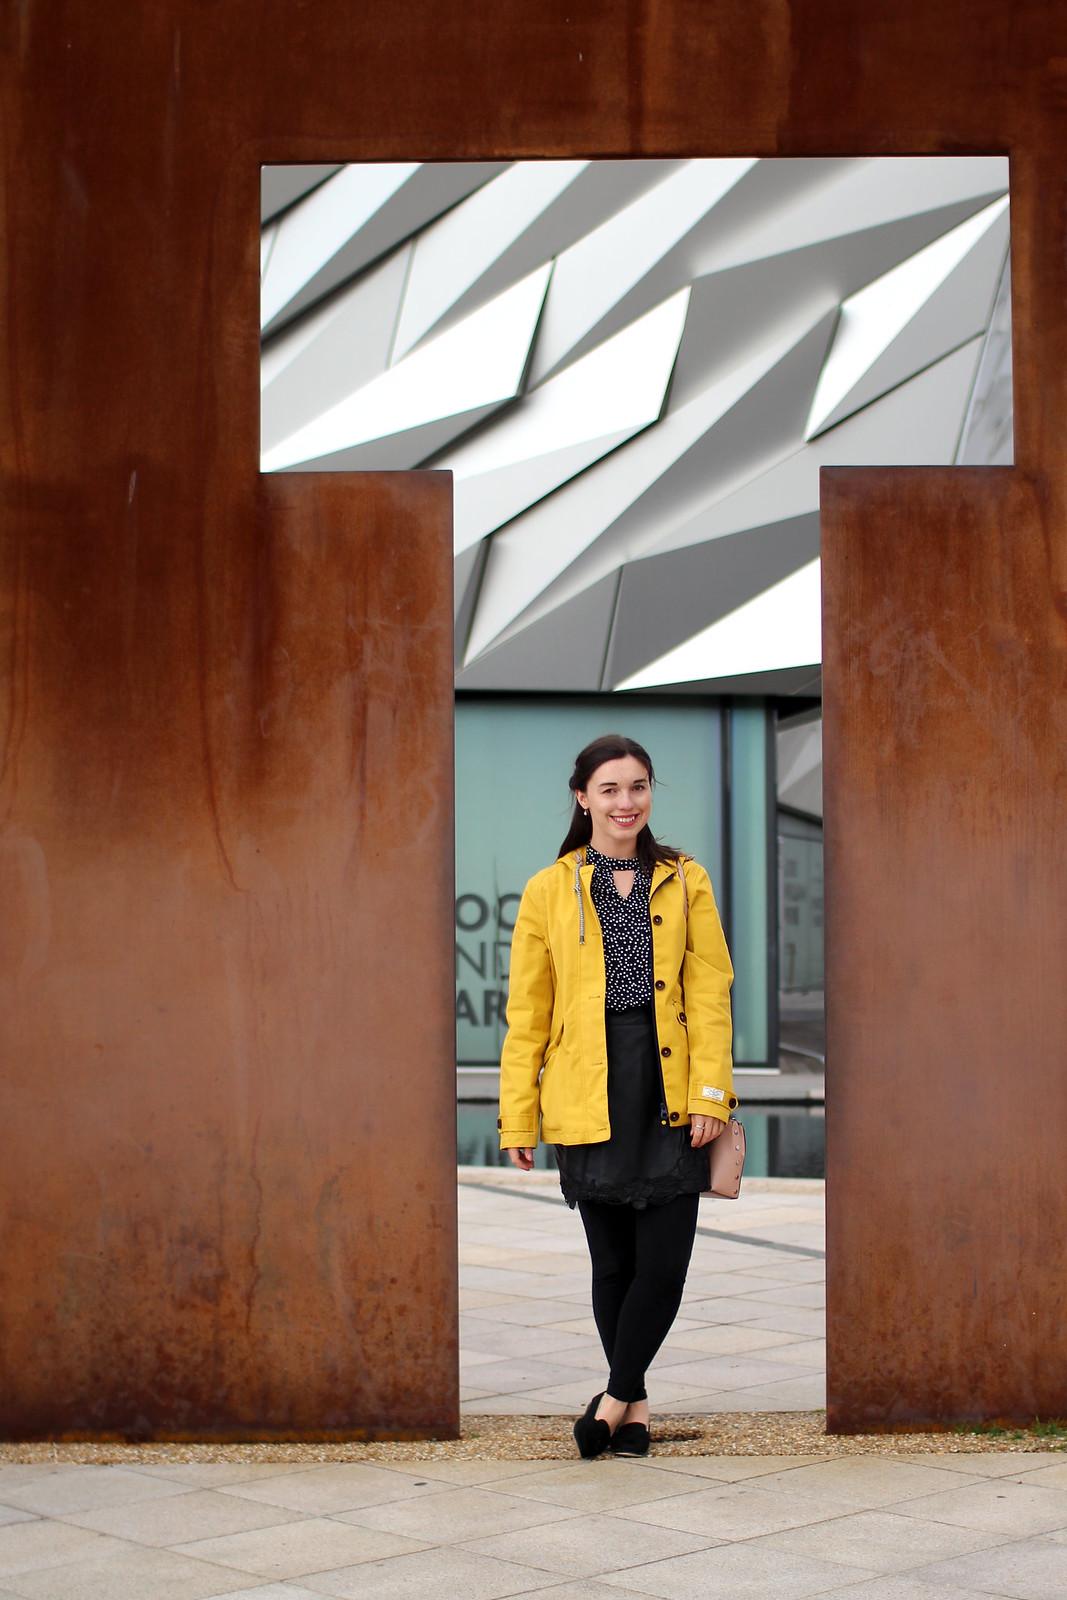 Titanic Museum Belfast 48 hour guide travel blogger UK Northern Ireland